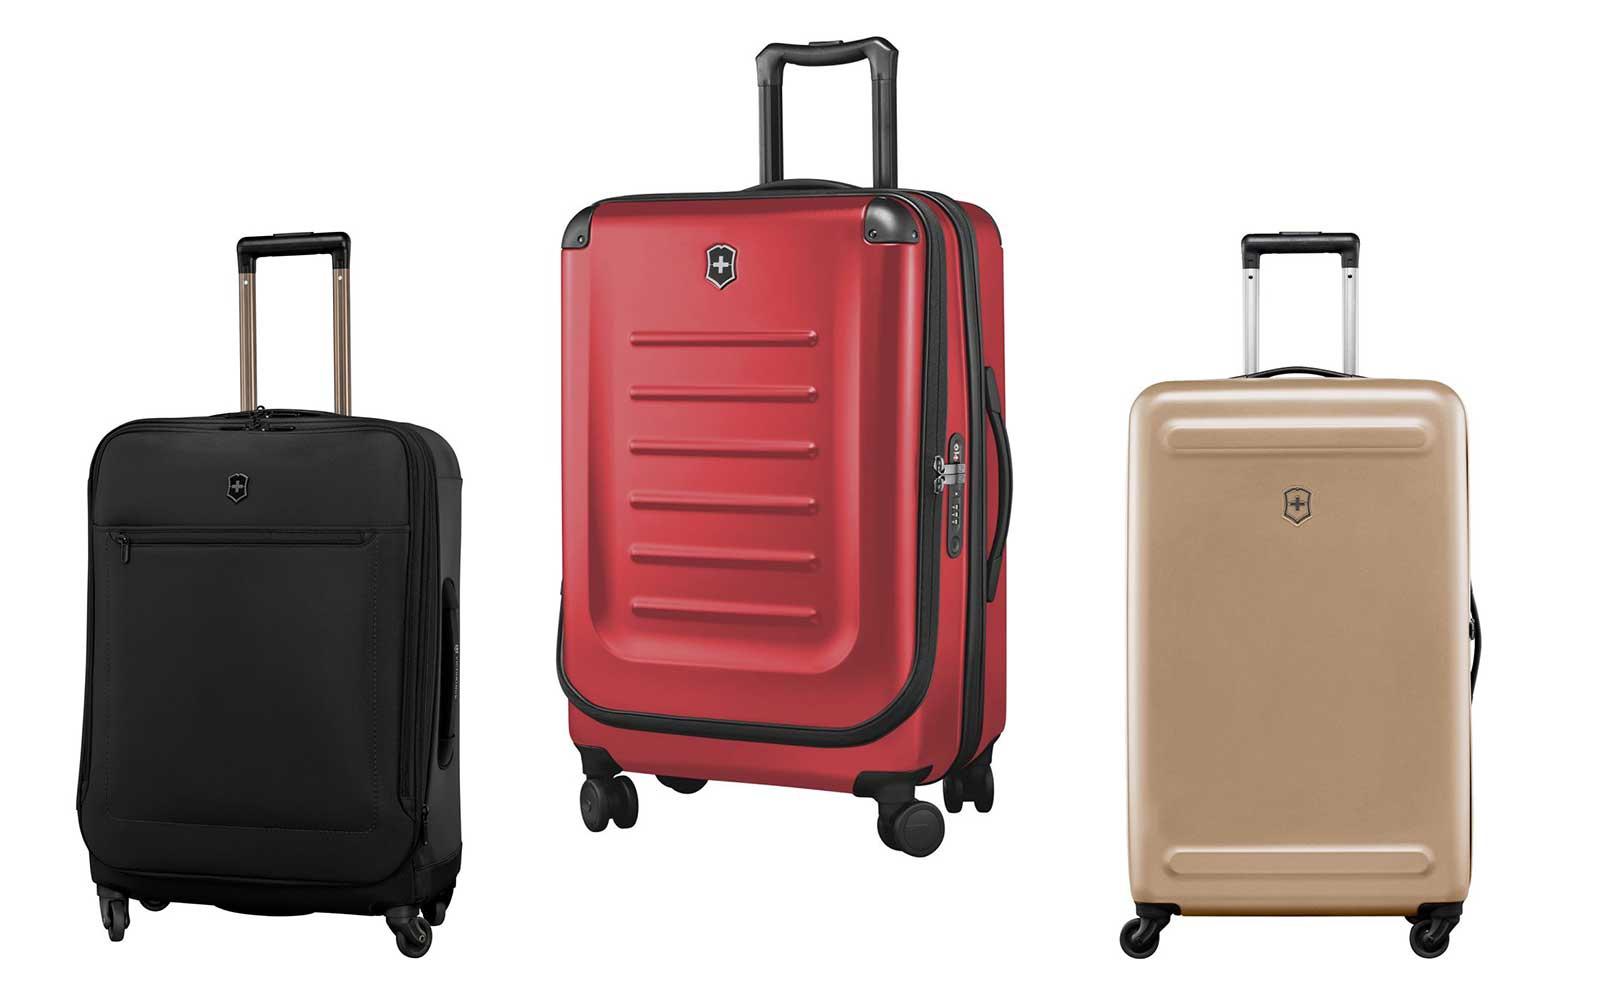 https://0201.nccdn.net/1_2/000/000/0c9/1dc/luggage4-1600x1000.jpg